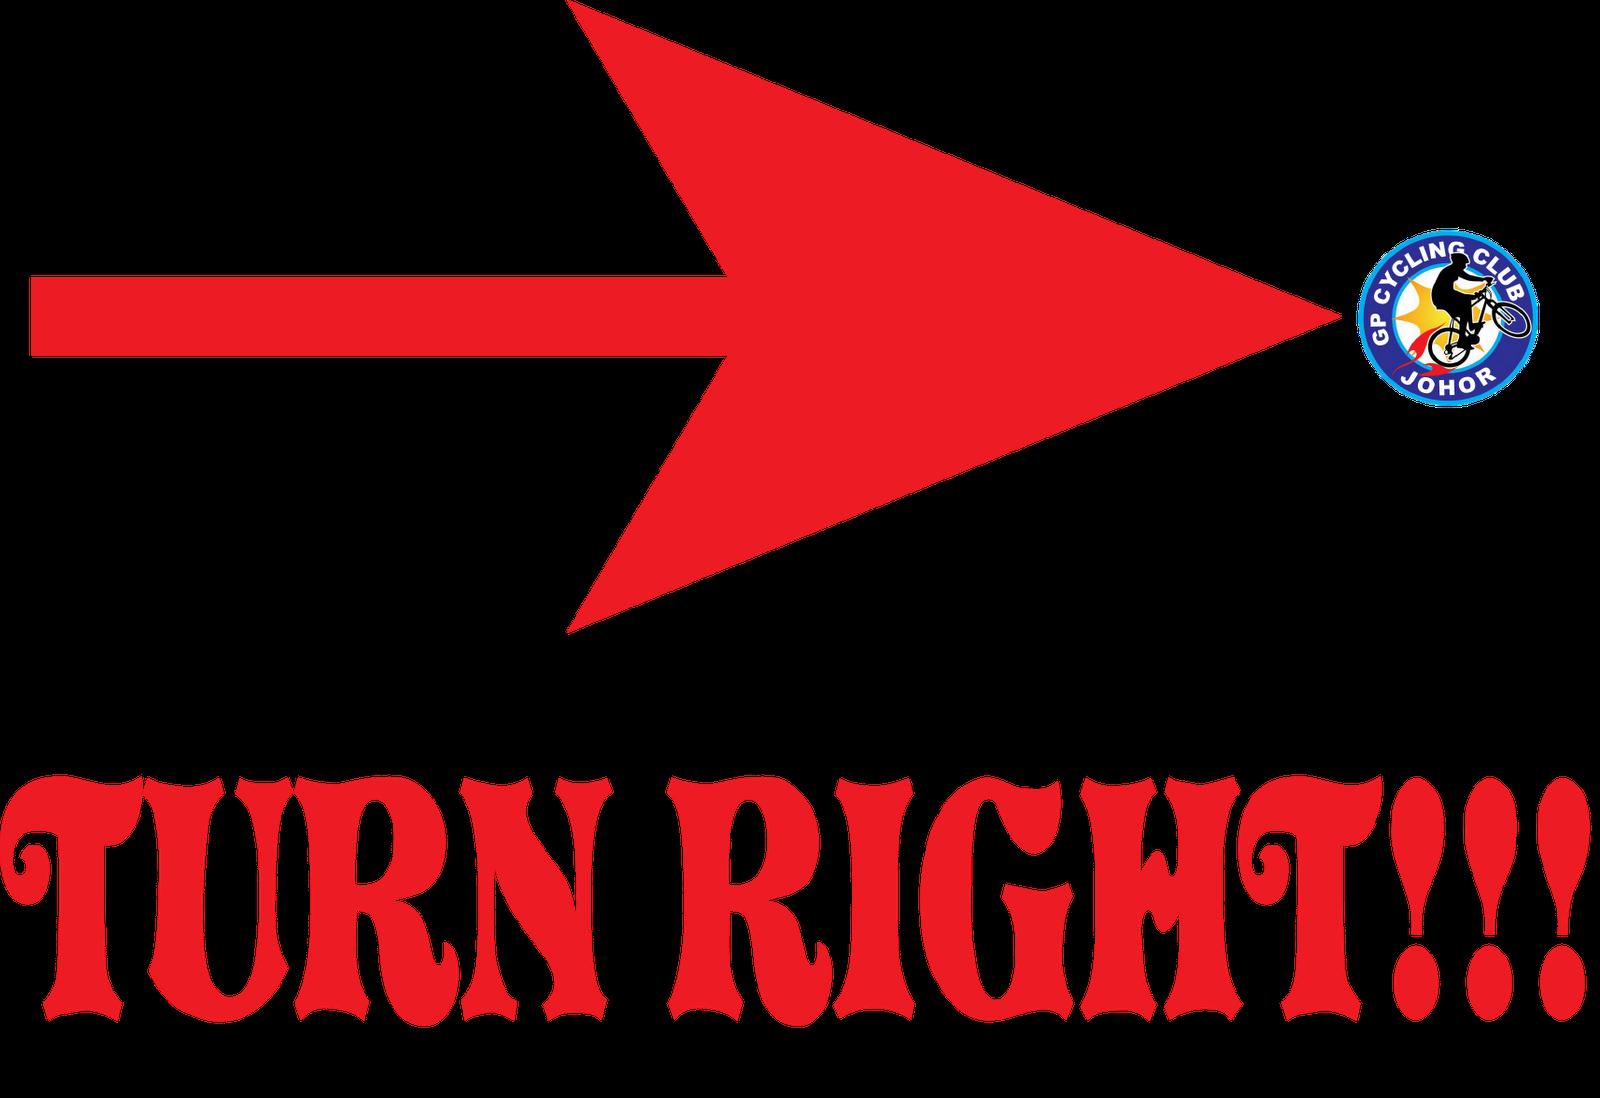 Turn Right Arrow Label